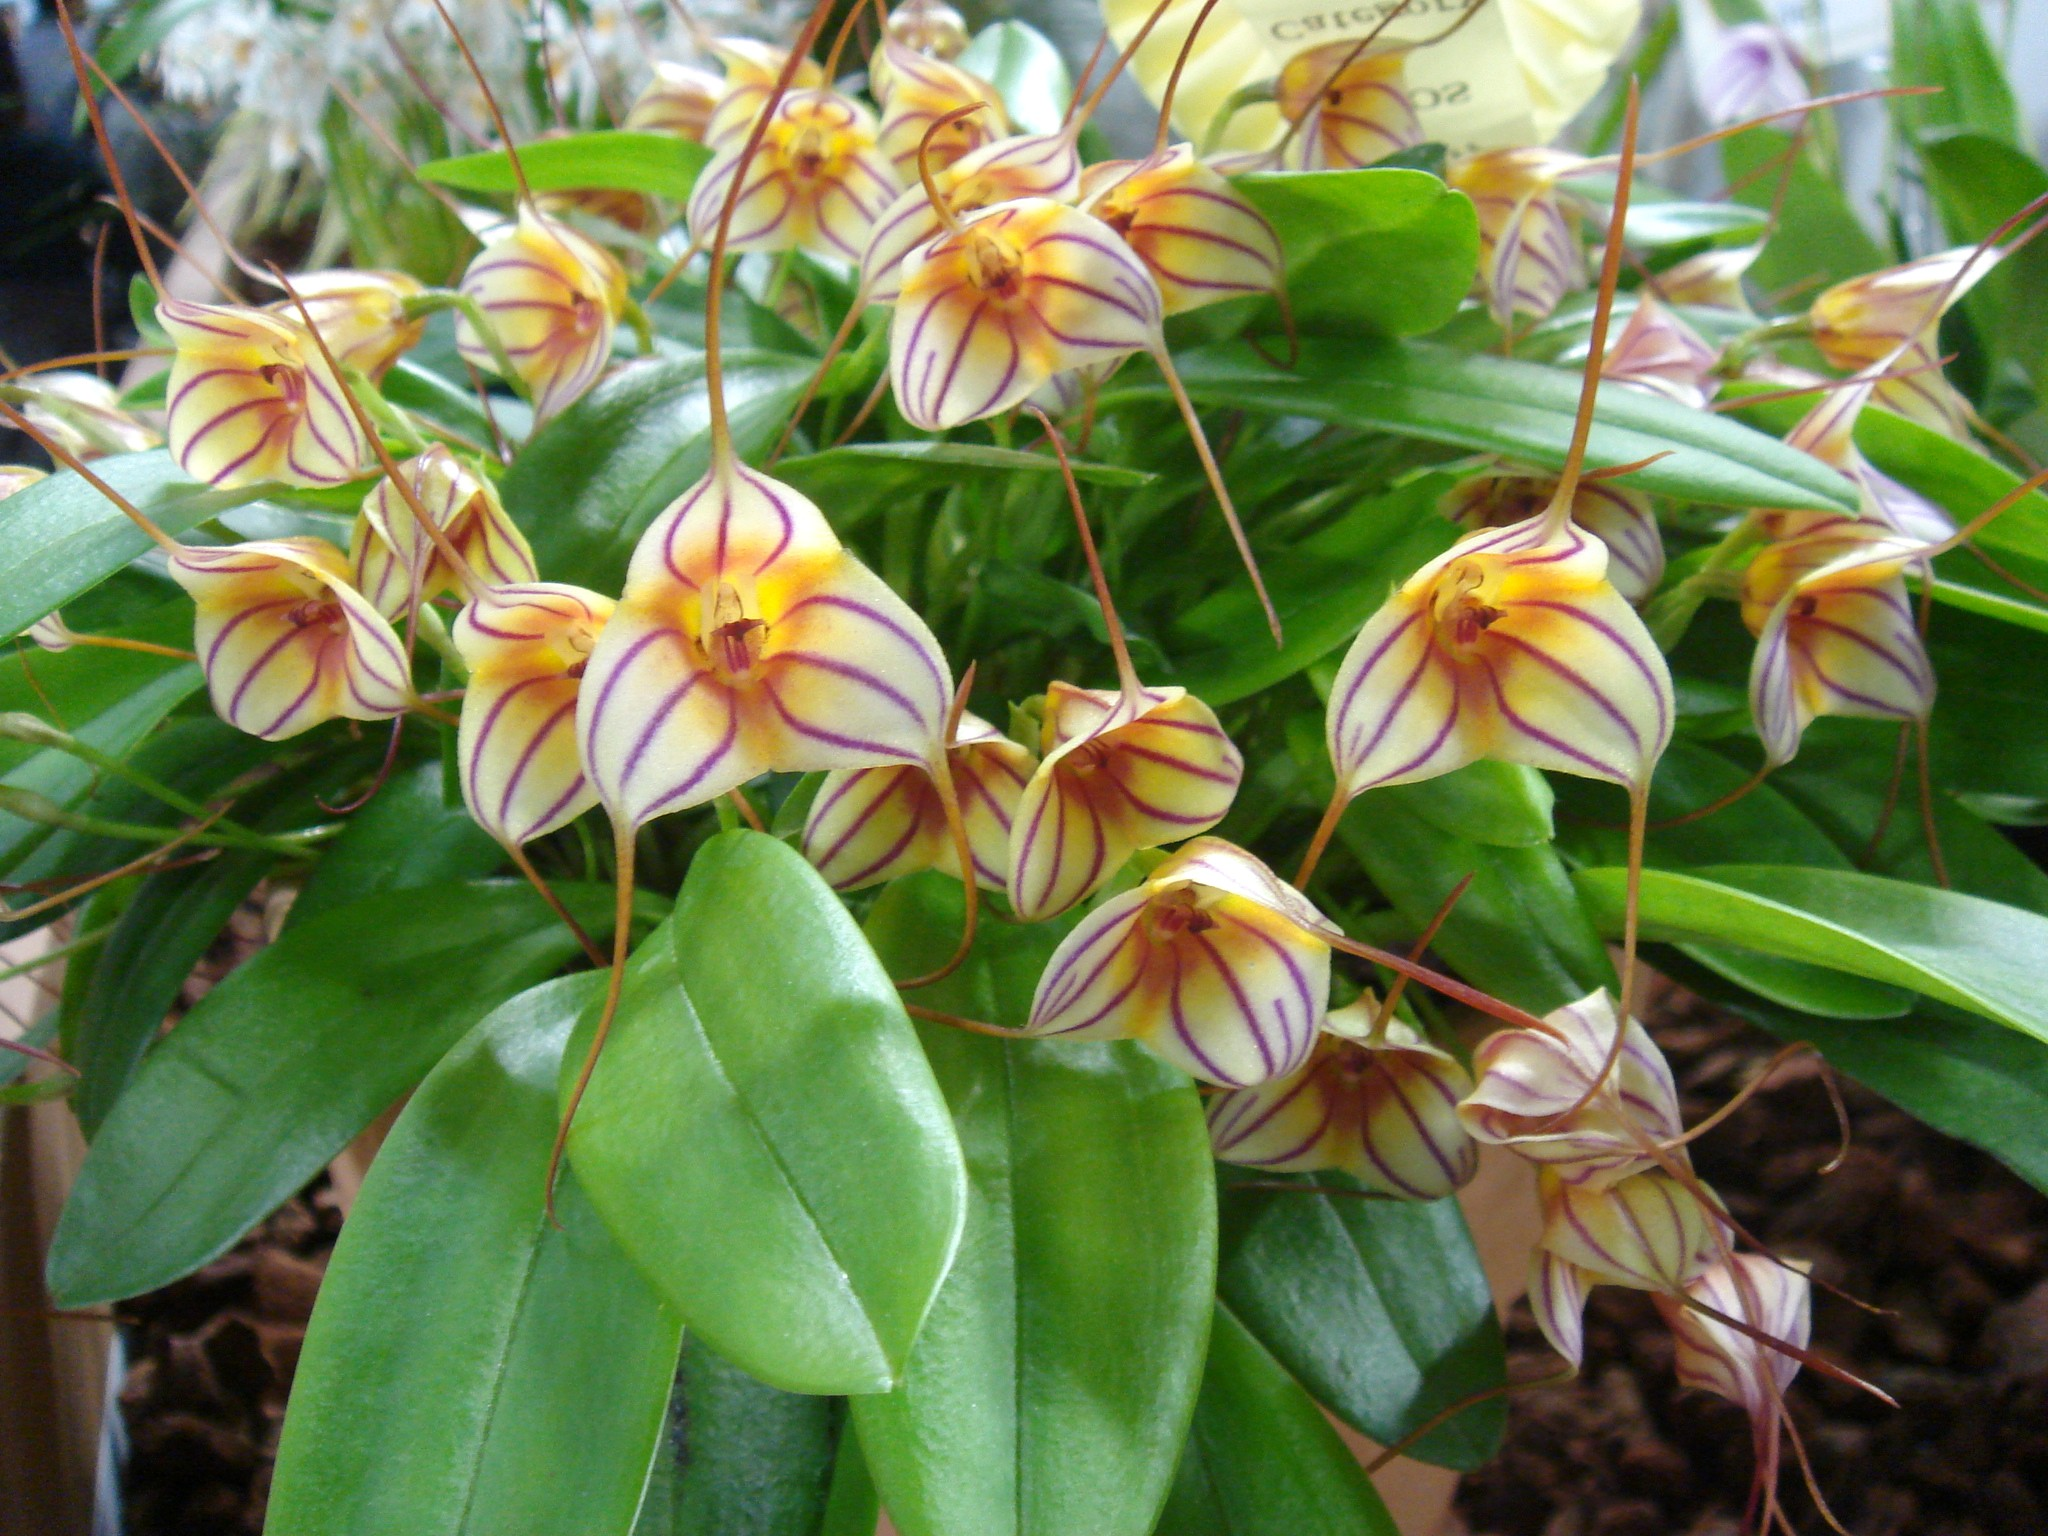 http://hybridorchid.la.coocan.jp/Masdevallia/Masdevallia%20Tuakau%20Candy/DSC06366.JPG